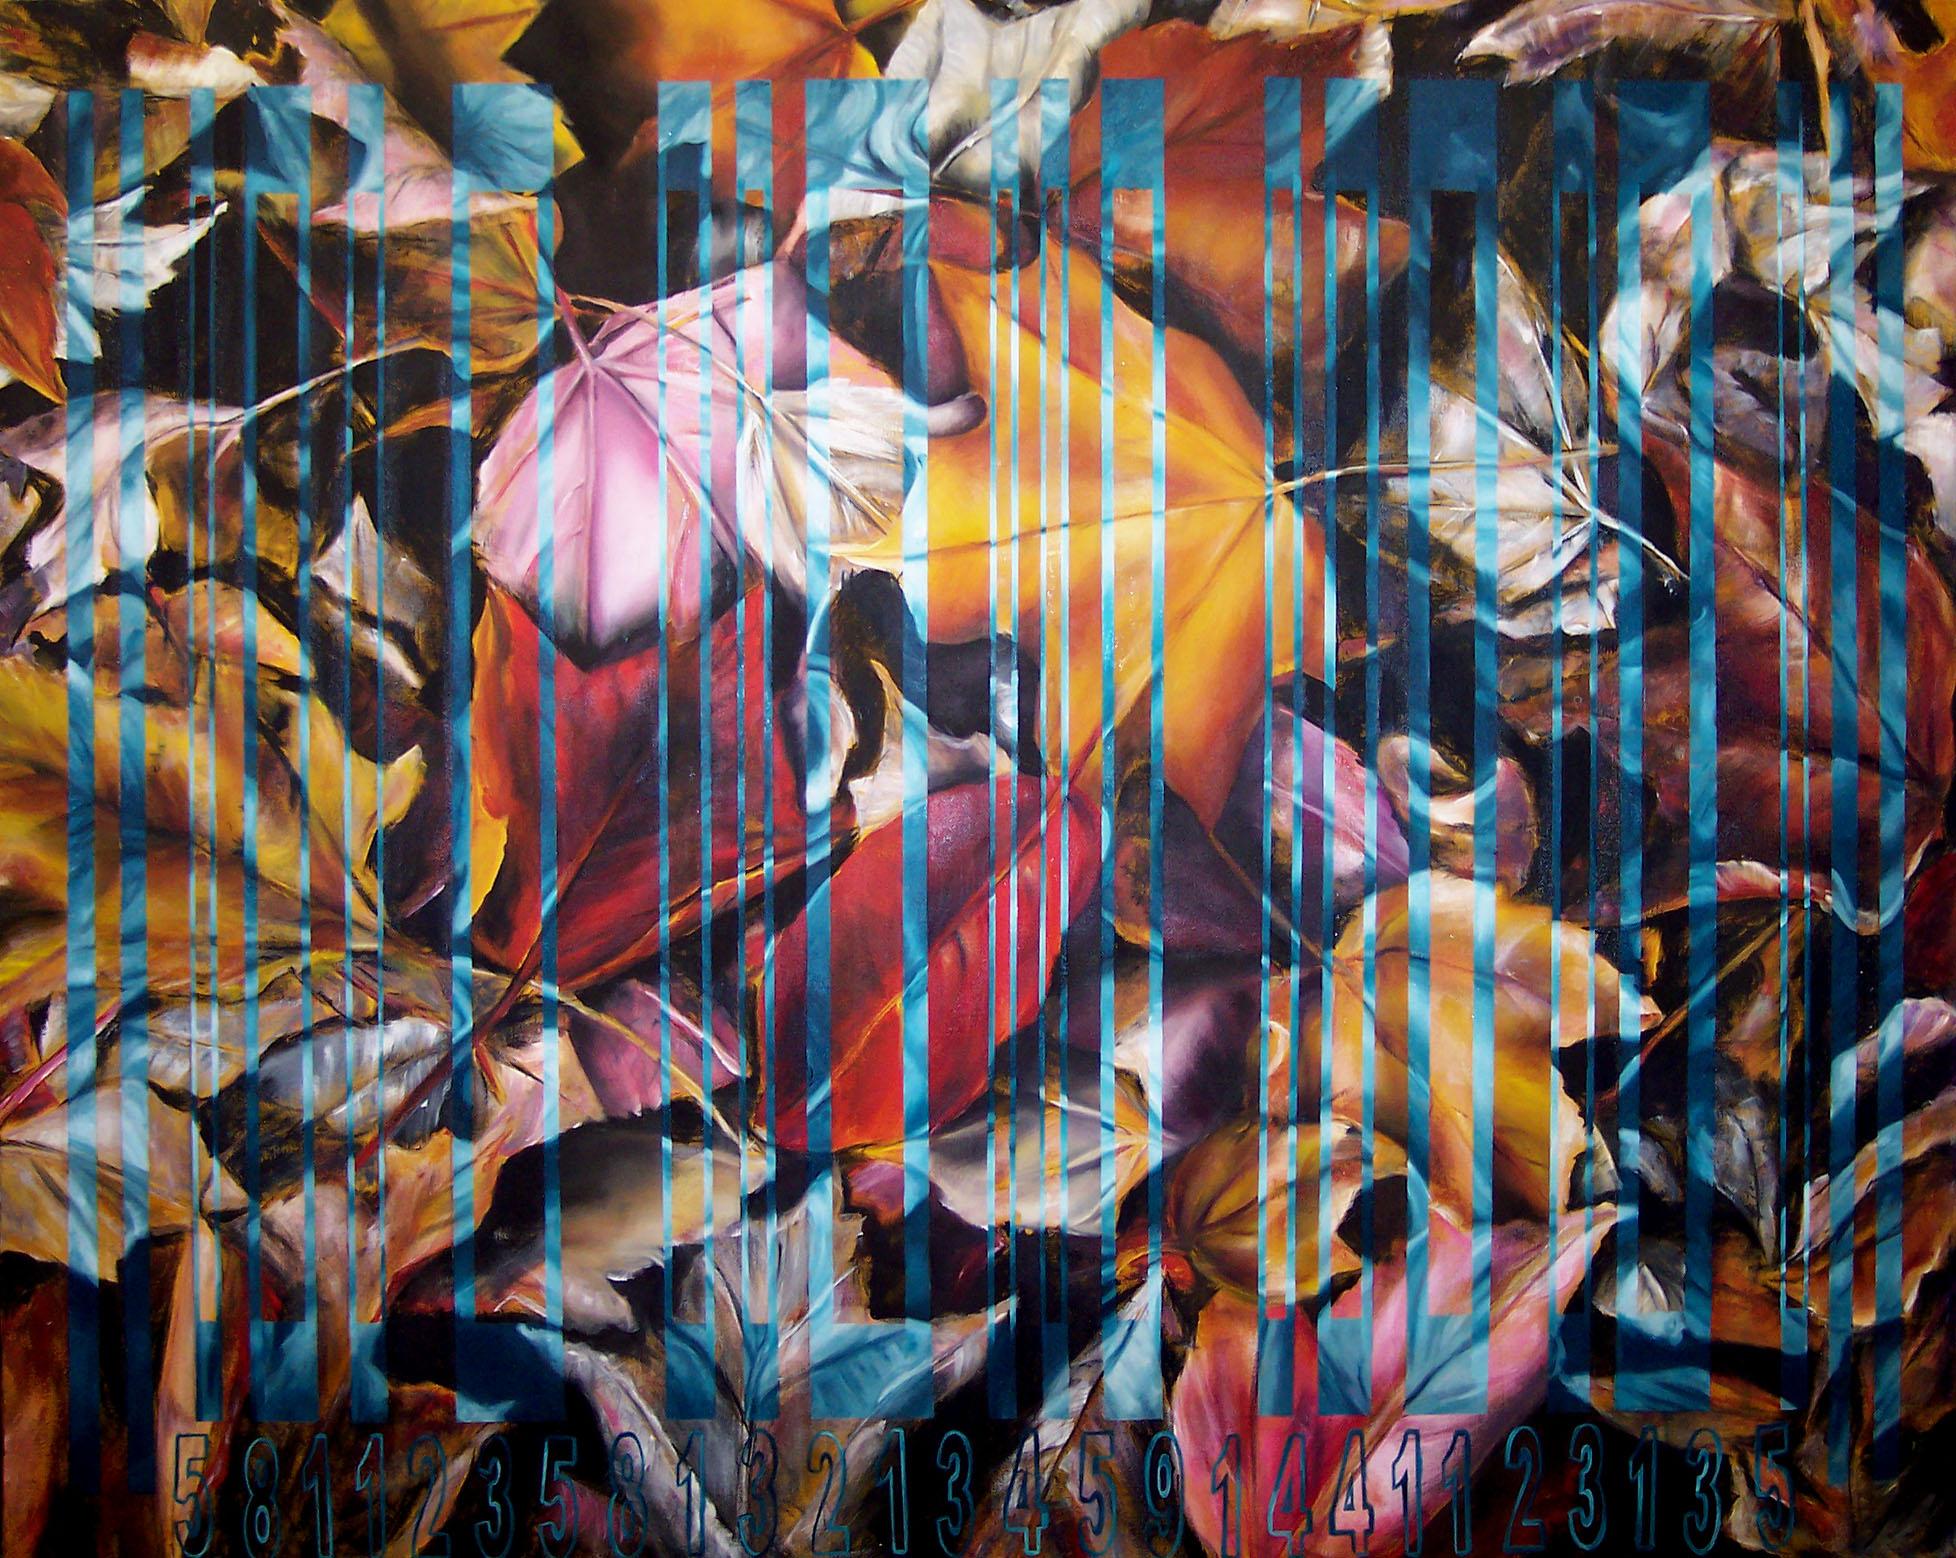 12-yapraklar,leaves, hojas116x89 tuv.üst yboya,oil on canvas,óleo sobre tela.jpg